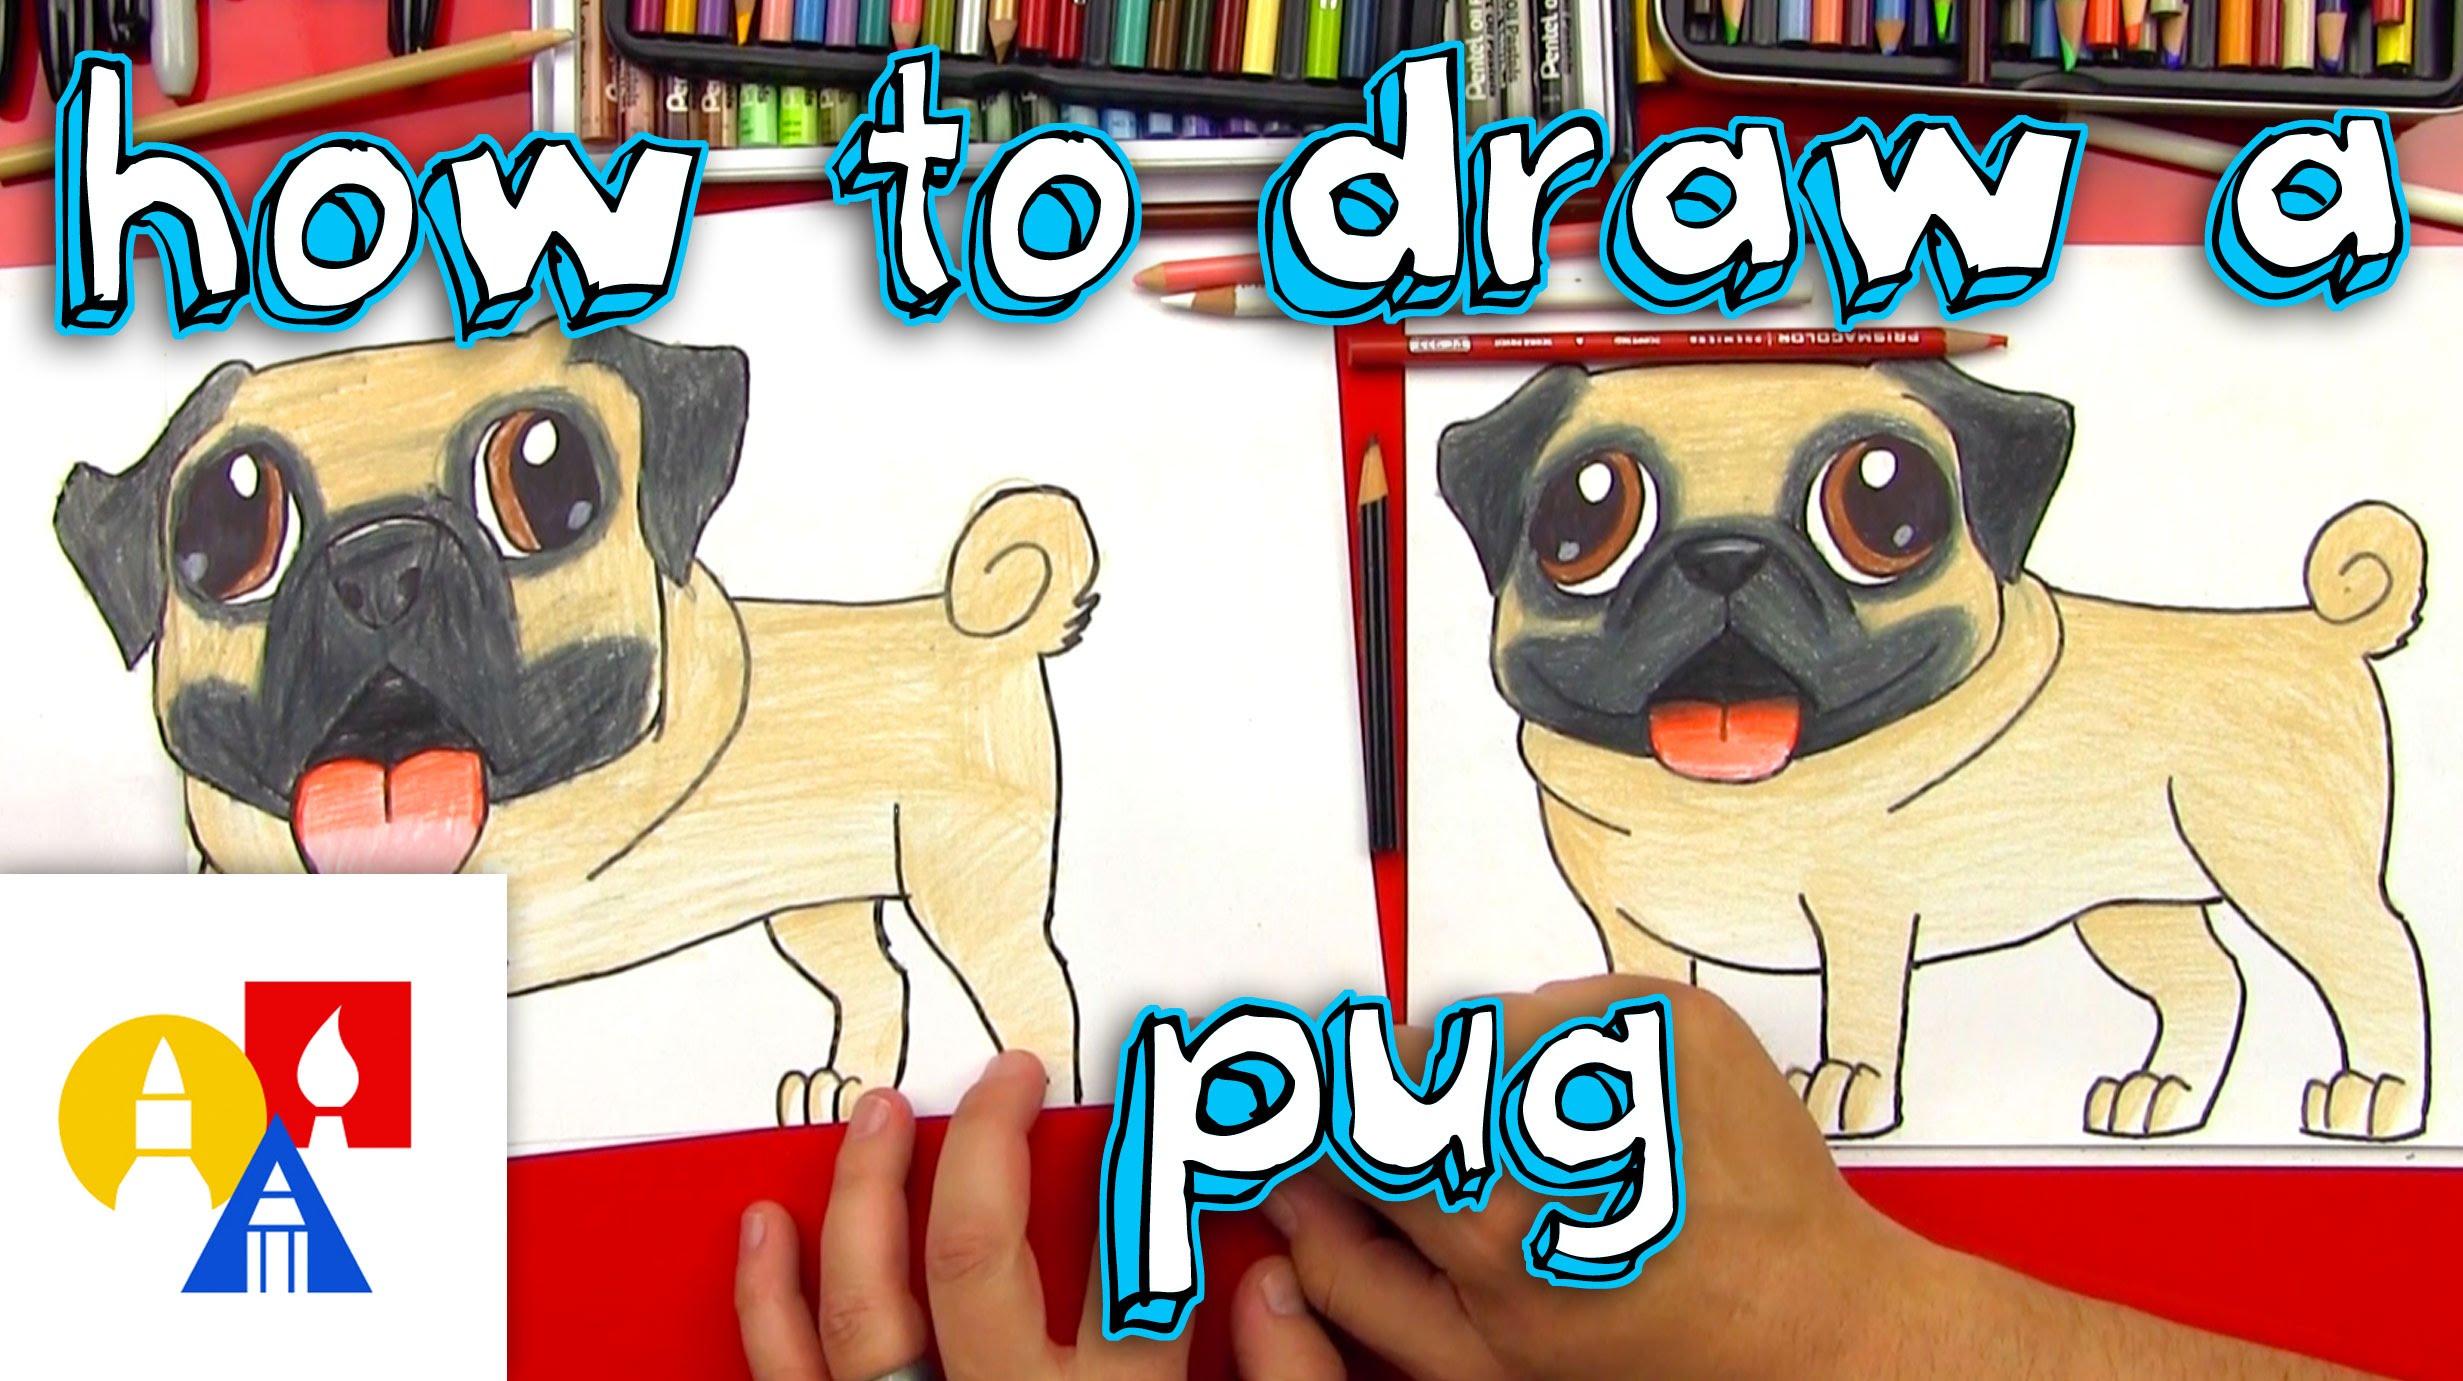 Drawn pug 8 bit Pug To  Draw How